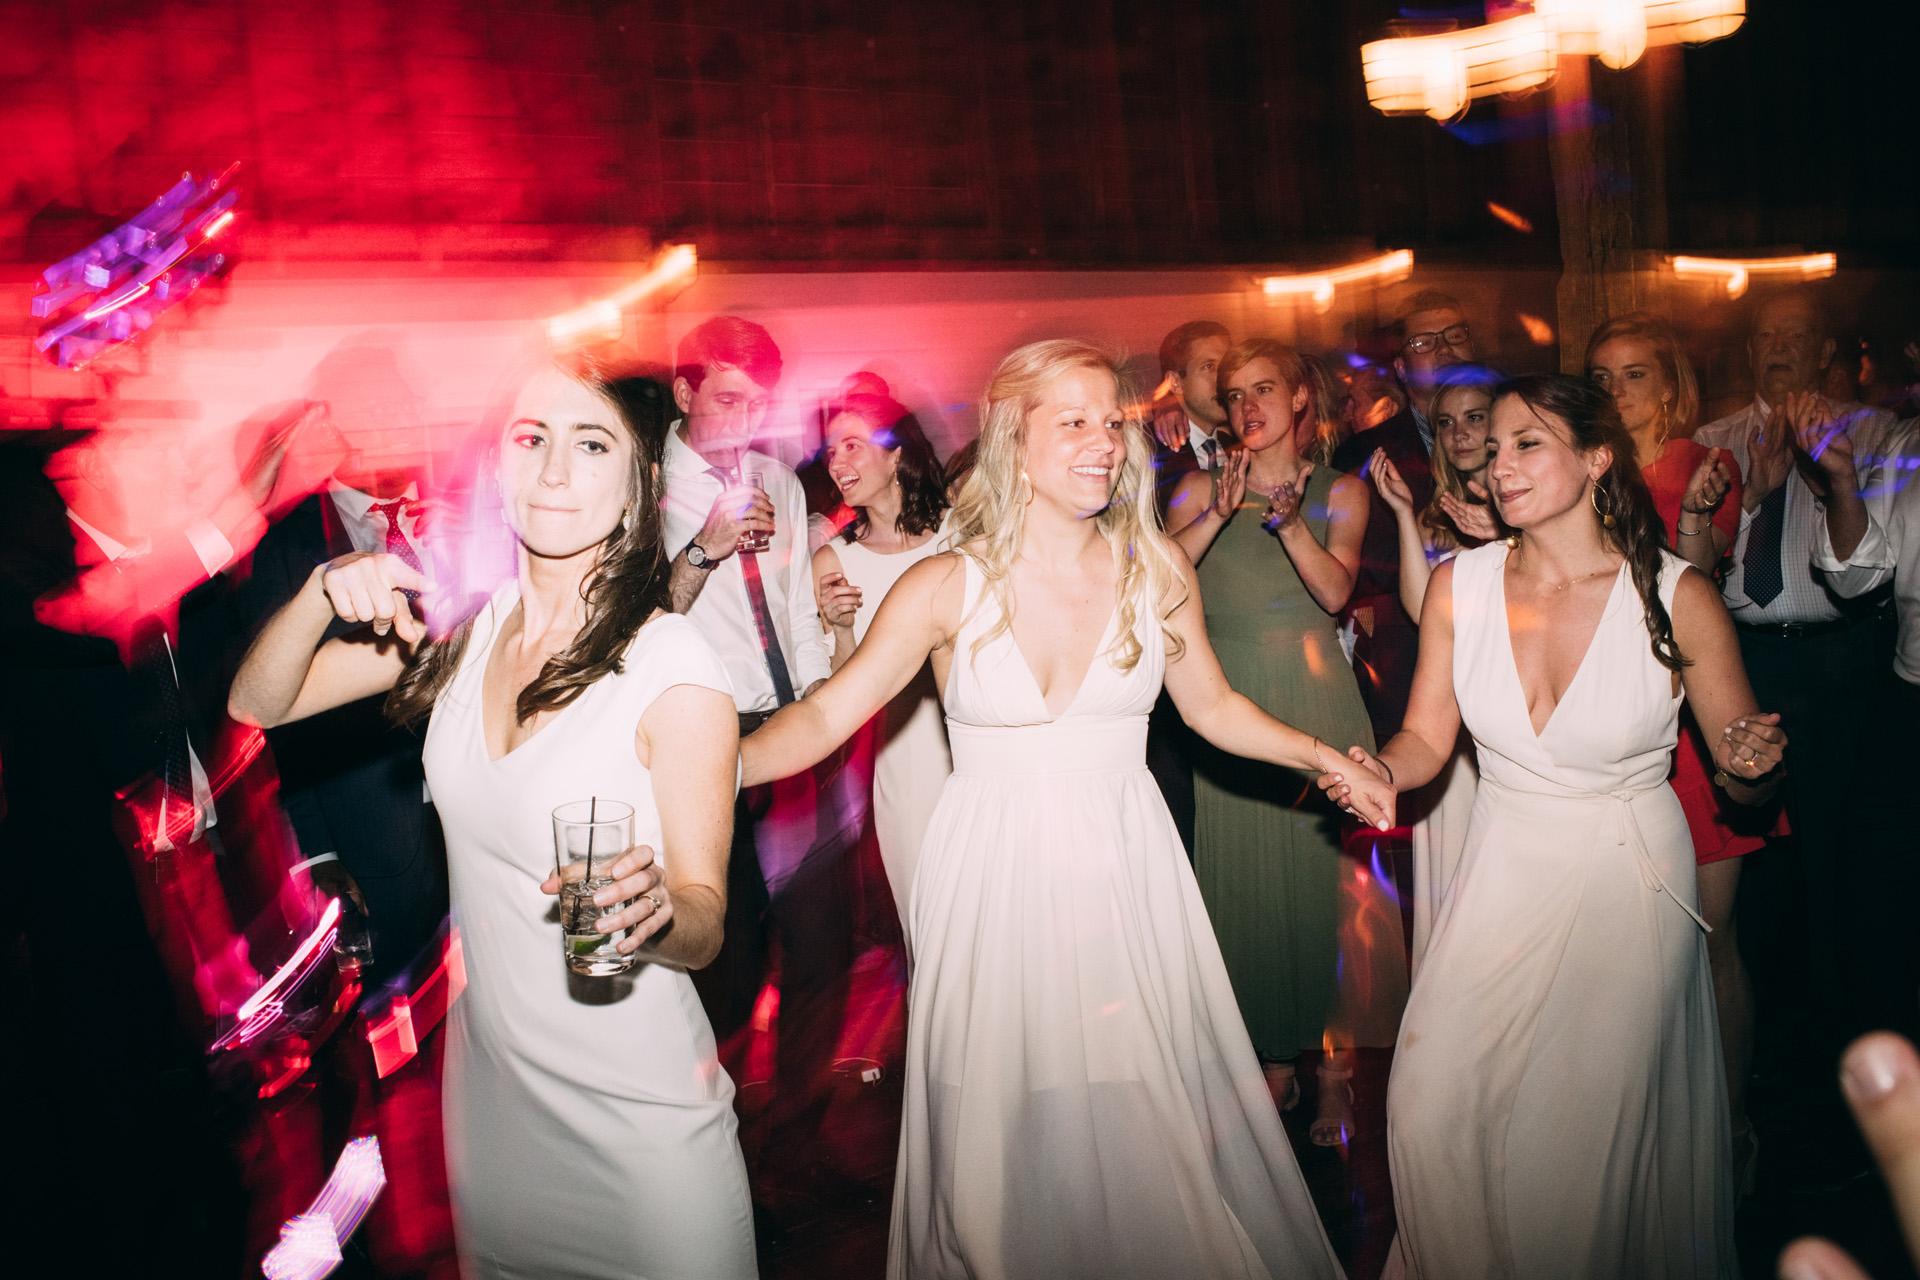 gedney-farm-wedding-photographer-73